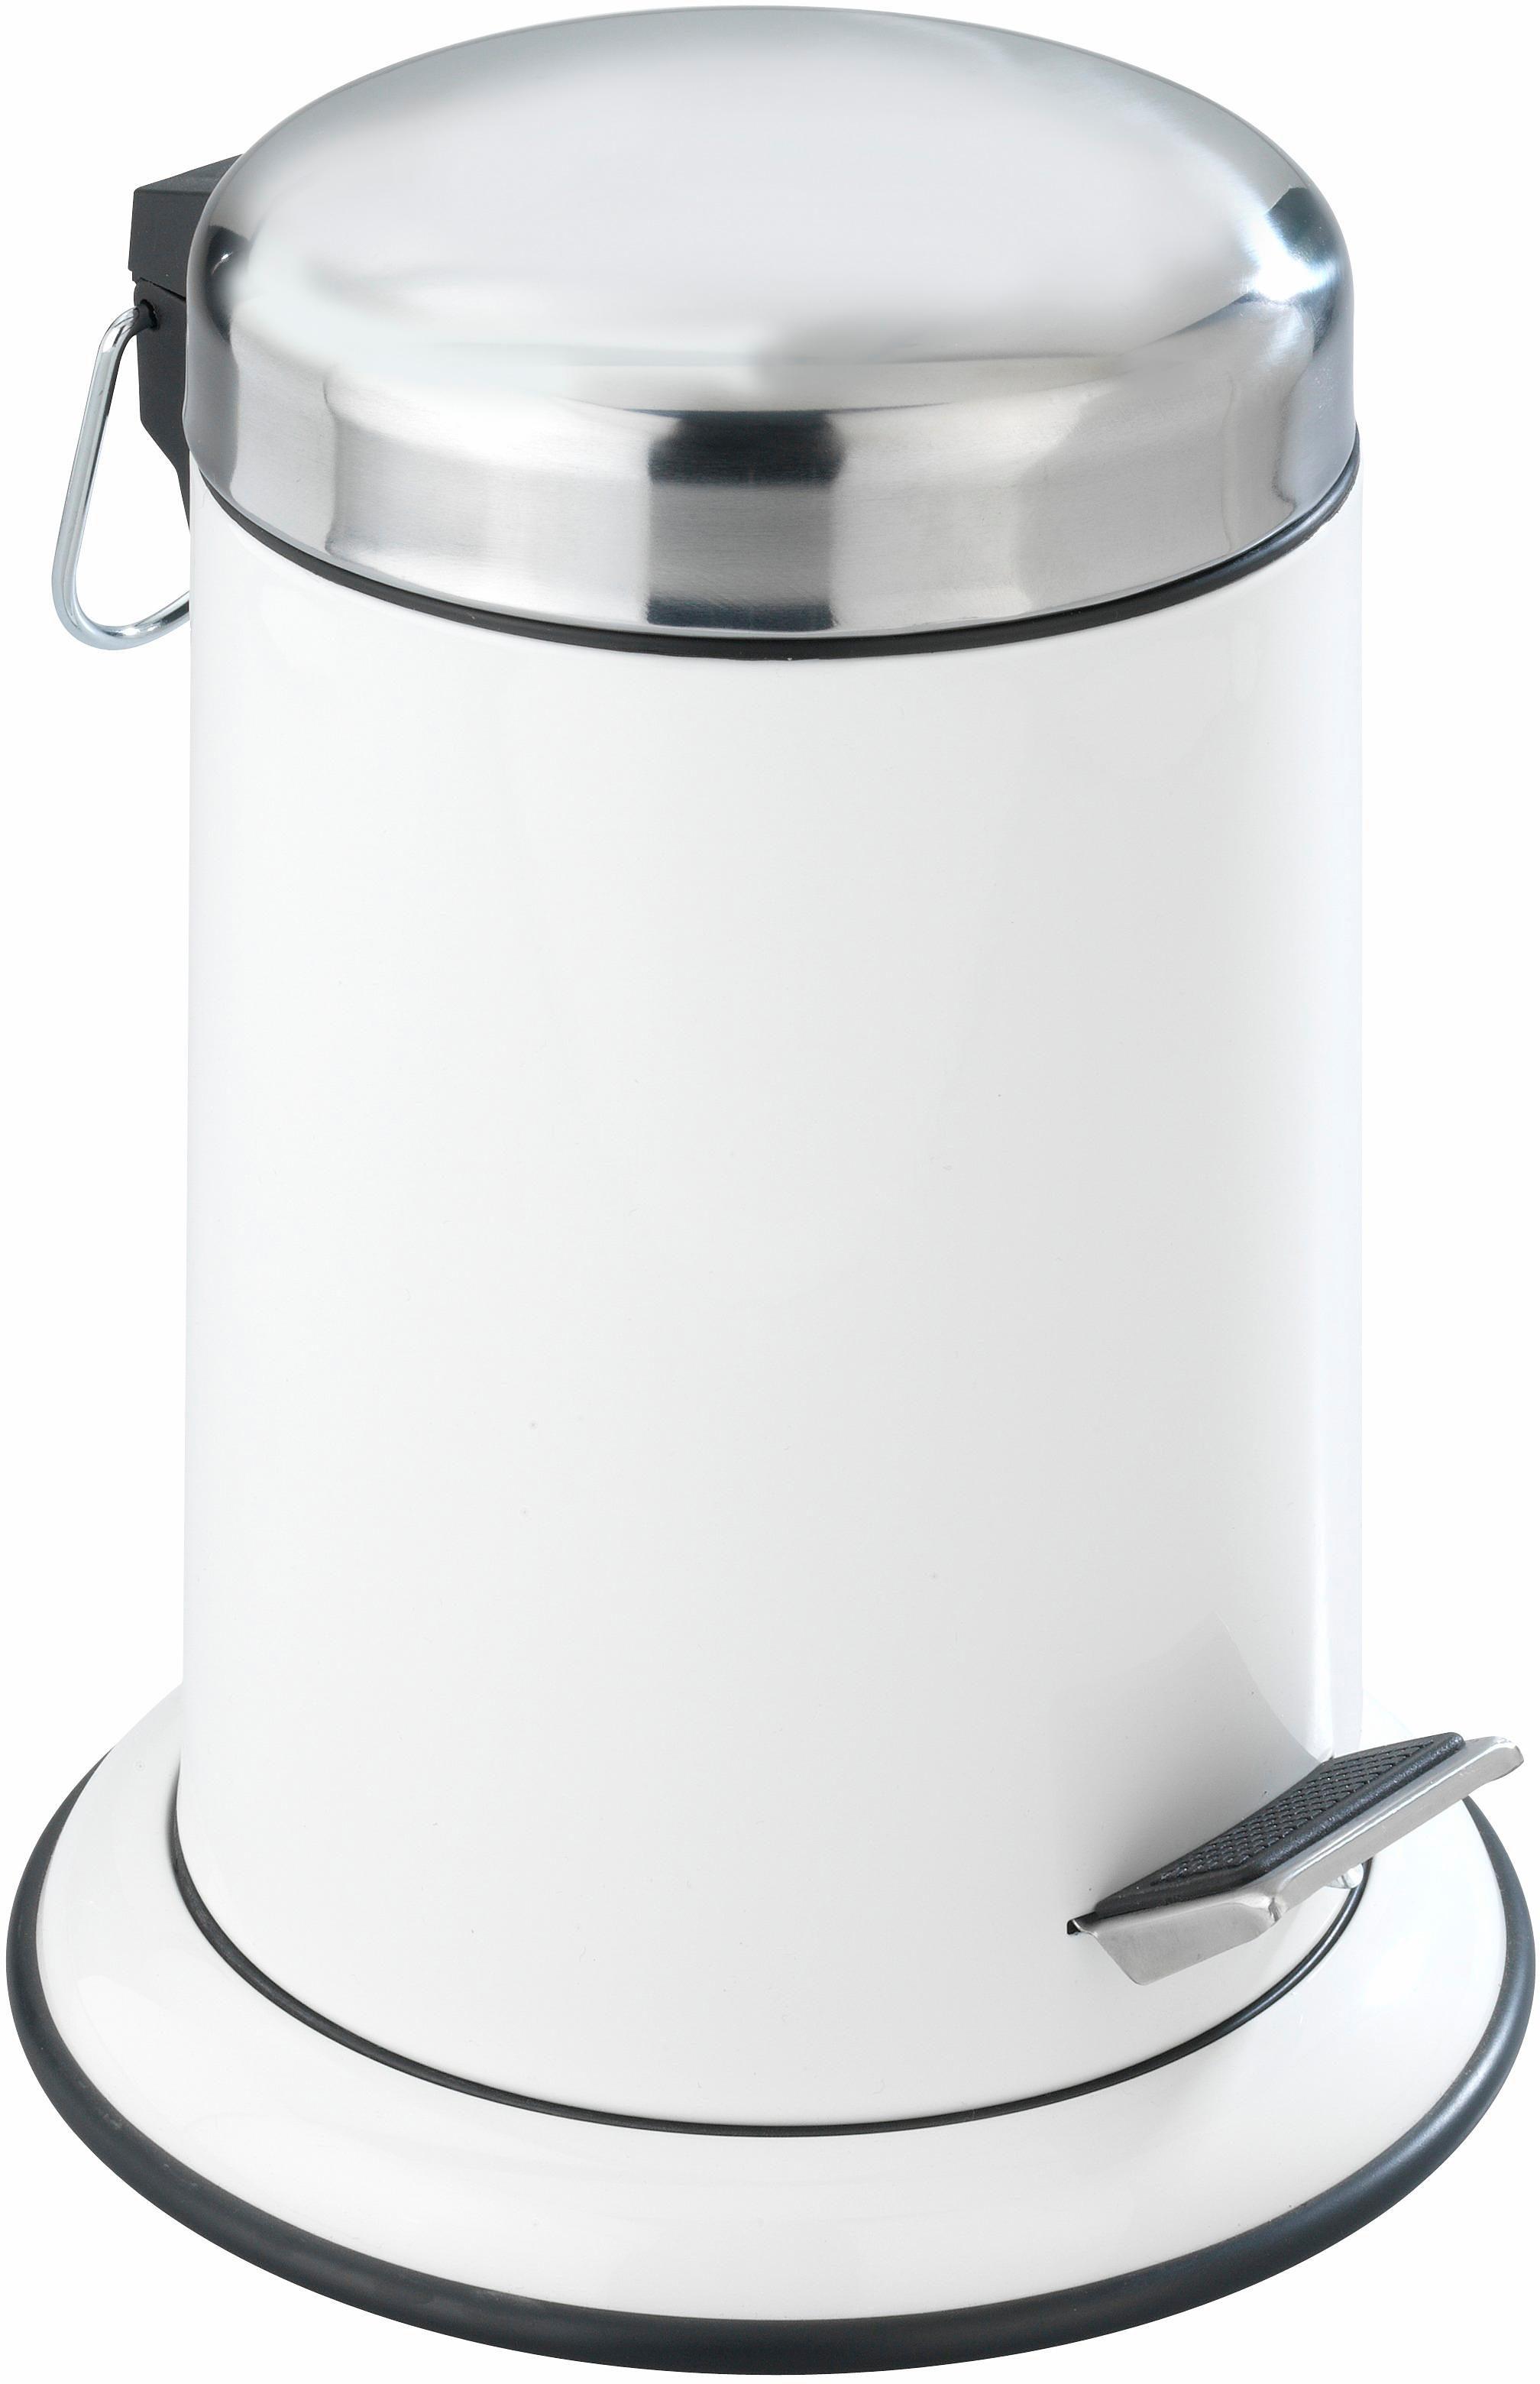 WENKO Kosmetik Treteimer Retoro, 3 Liter, Edelstahl rostfrei